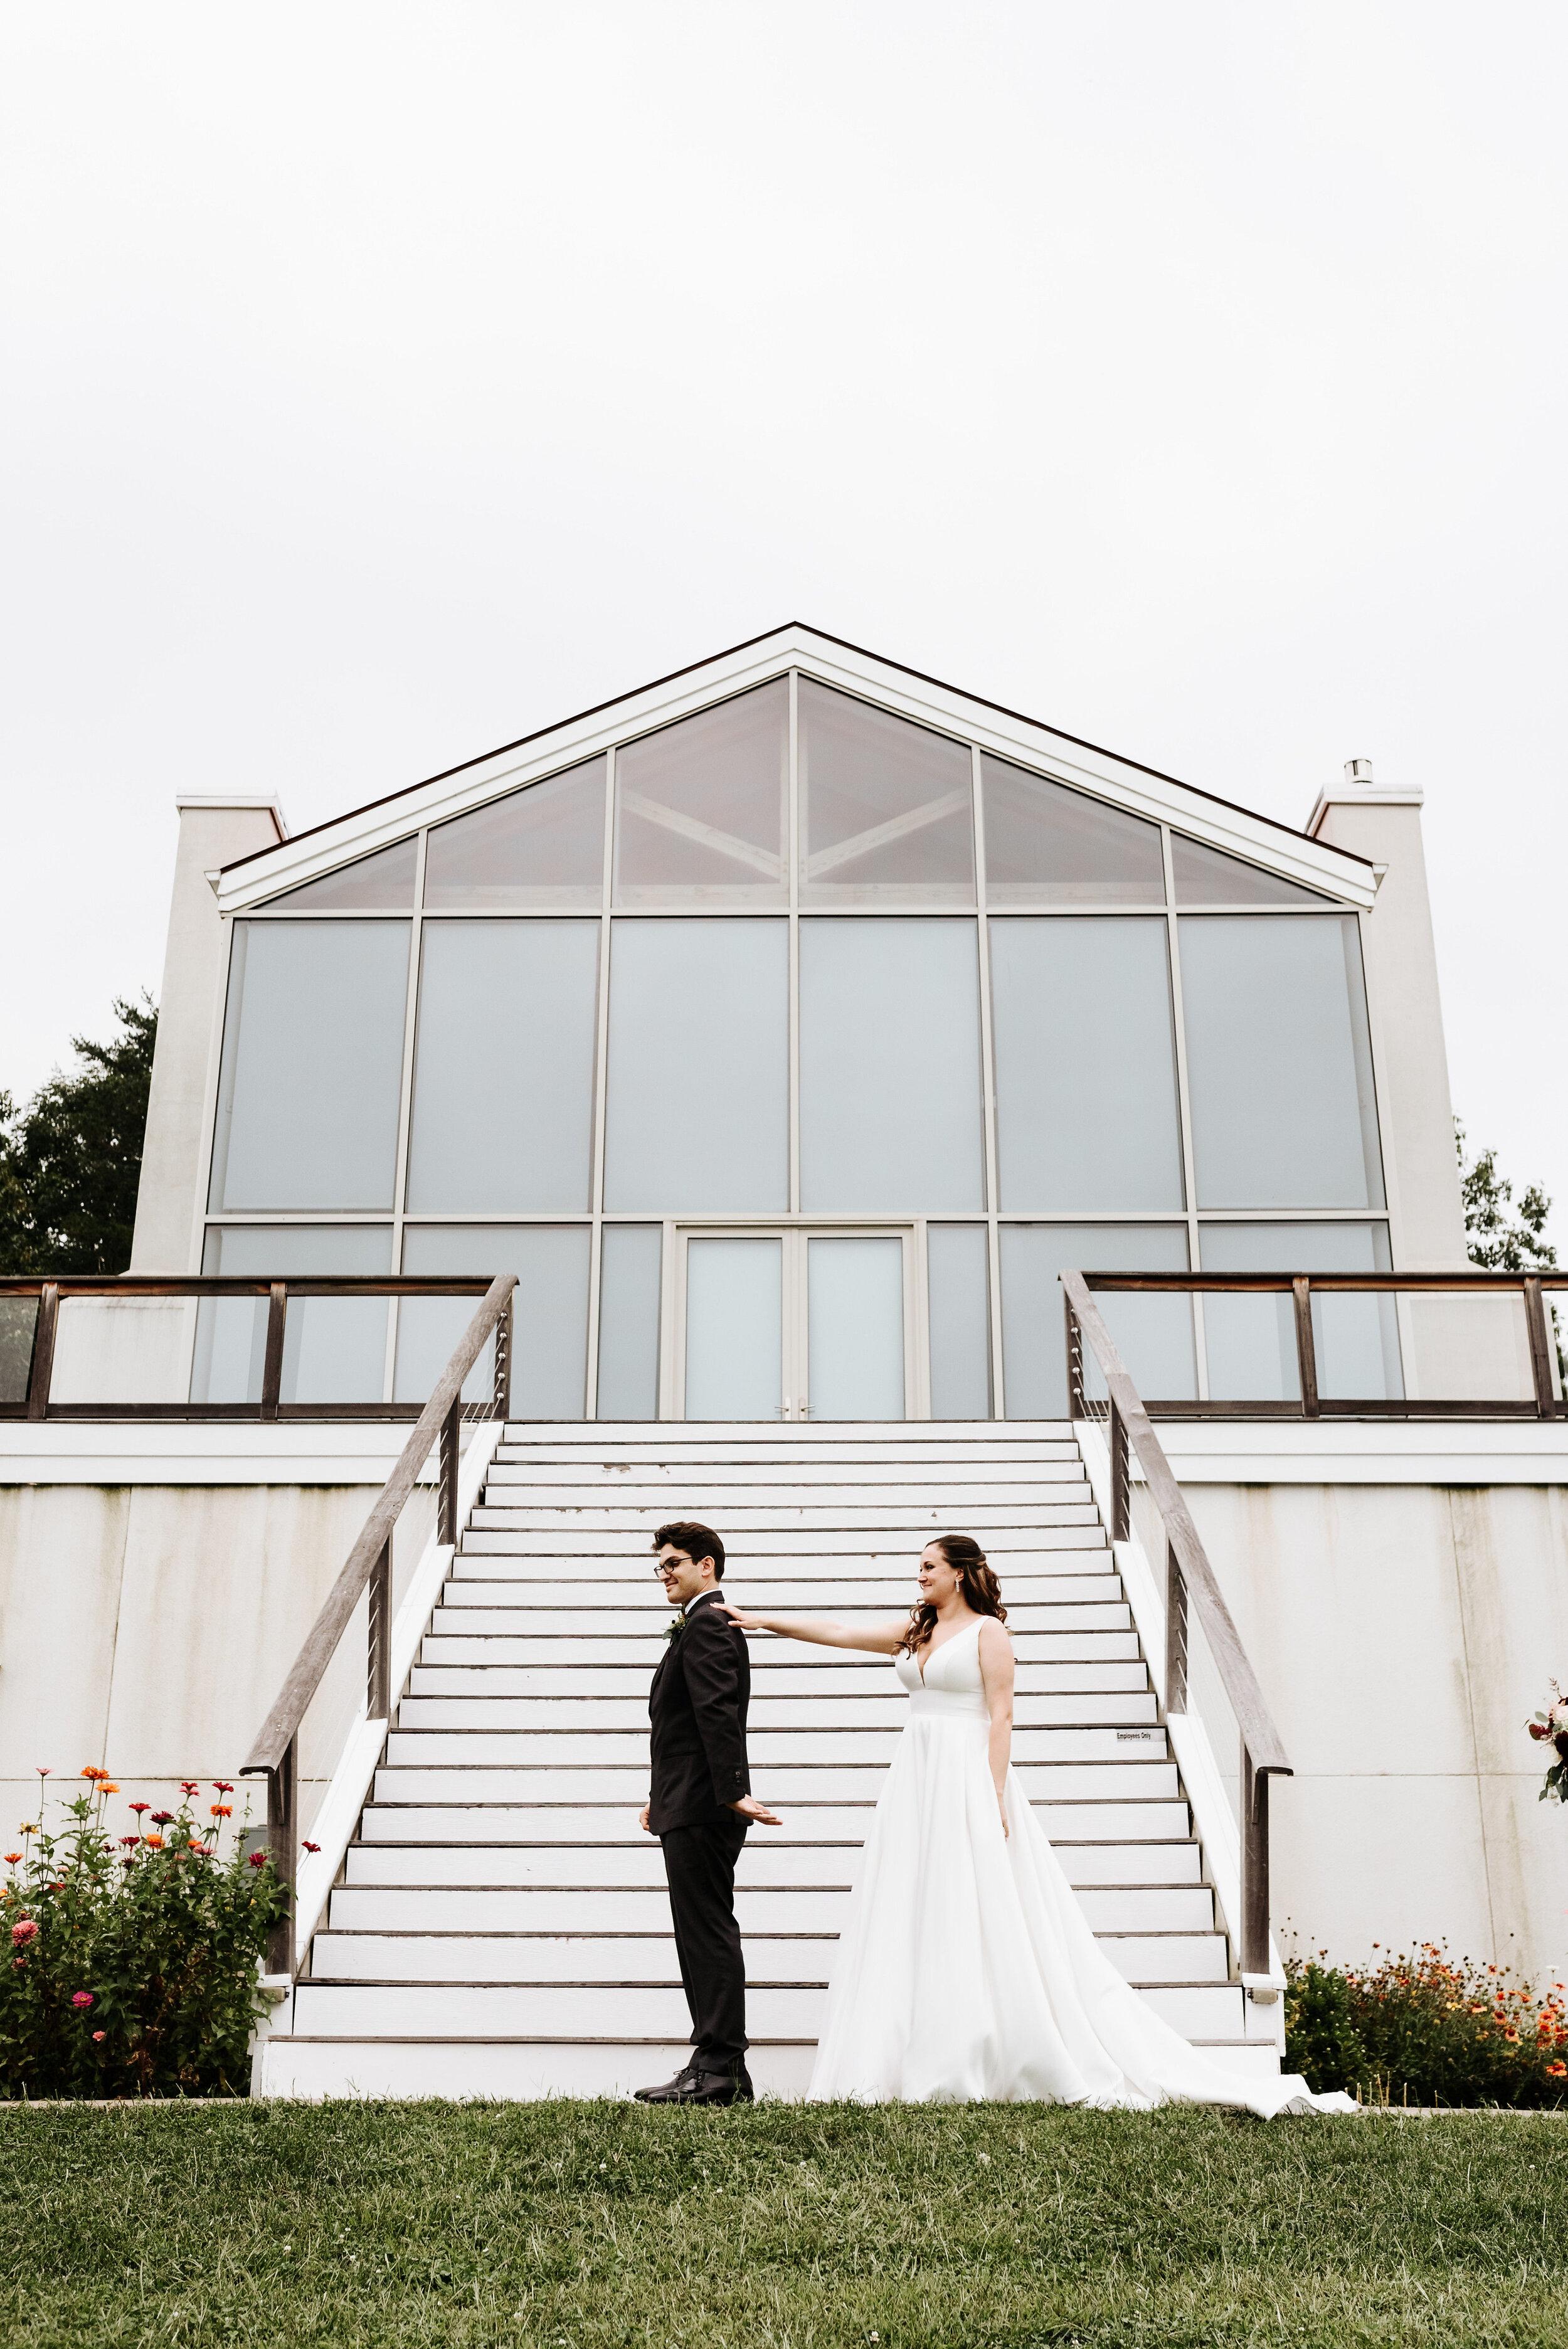 Allison_Nolan_Moss_Vineyards_Wedding_Charlottesville_Virginia_Photography_by_V_26.jpg